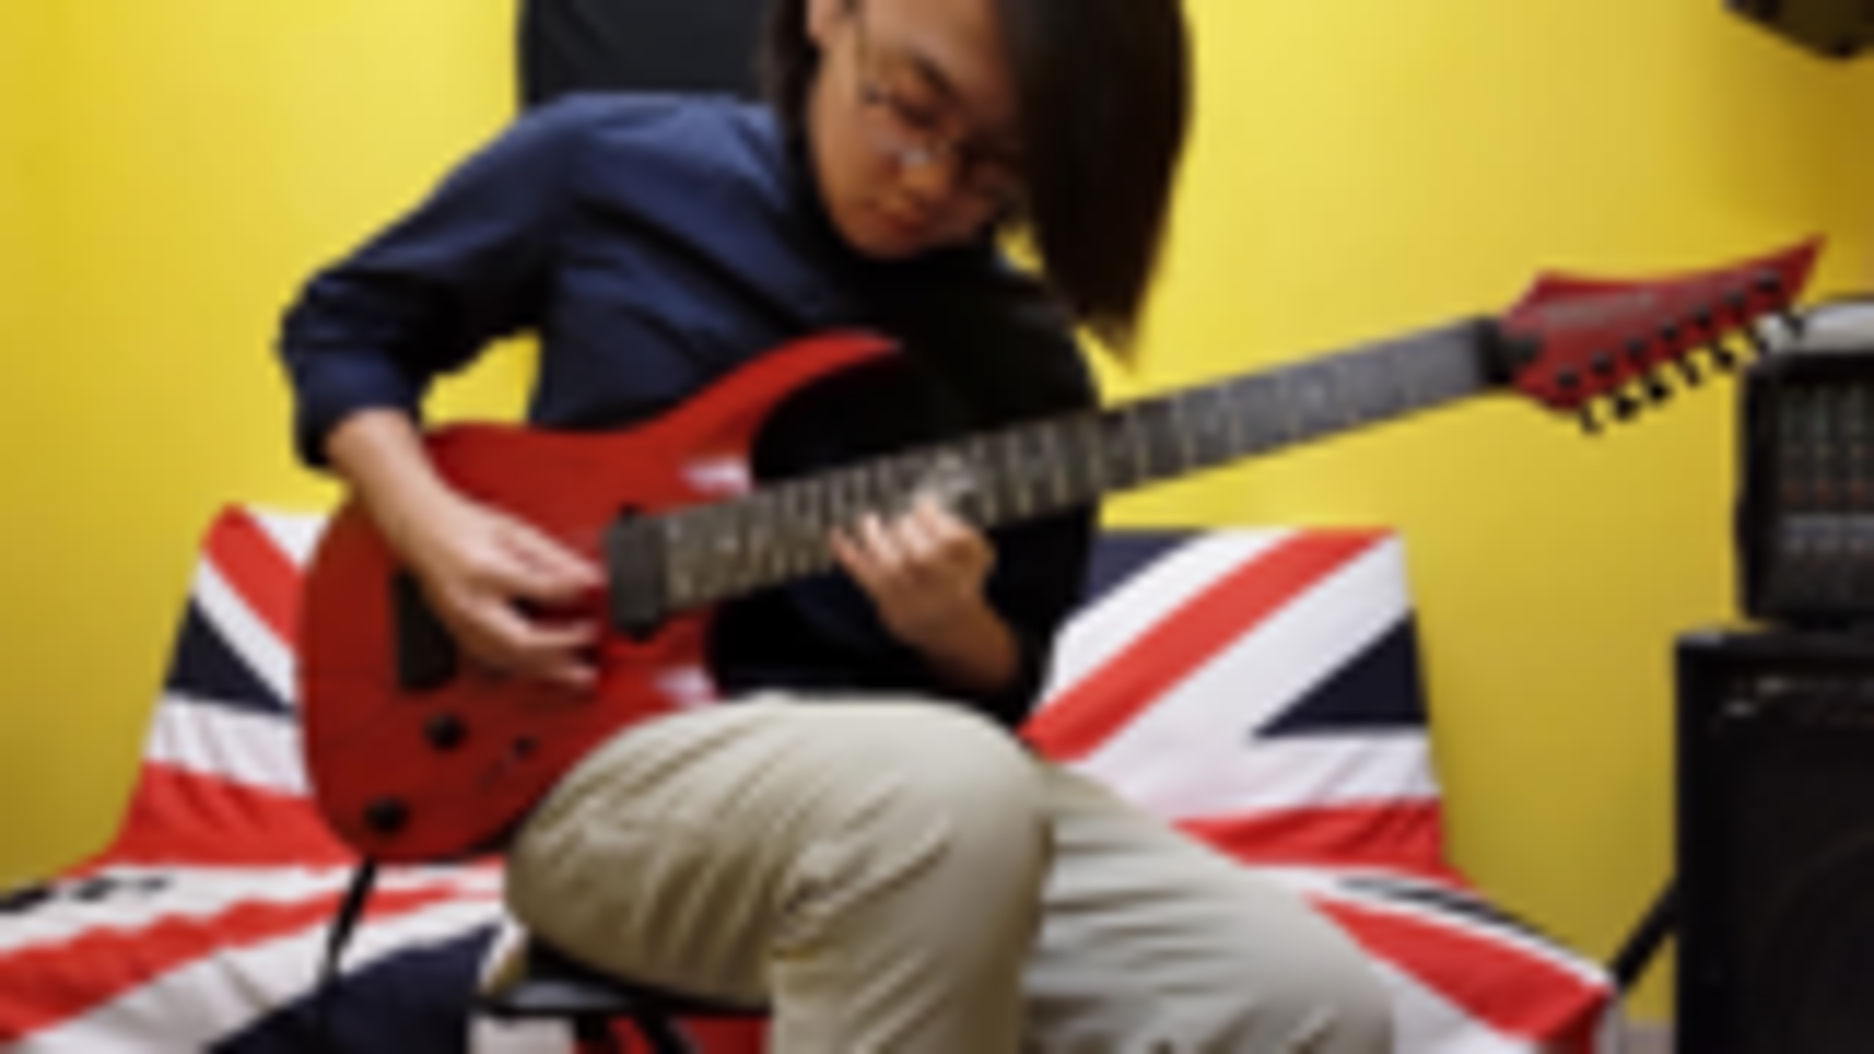 【Guitar Cover】G5 Project 2016 - Surge 这是我弟,97单身